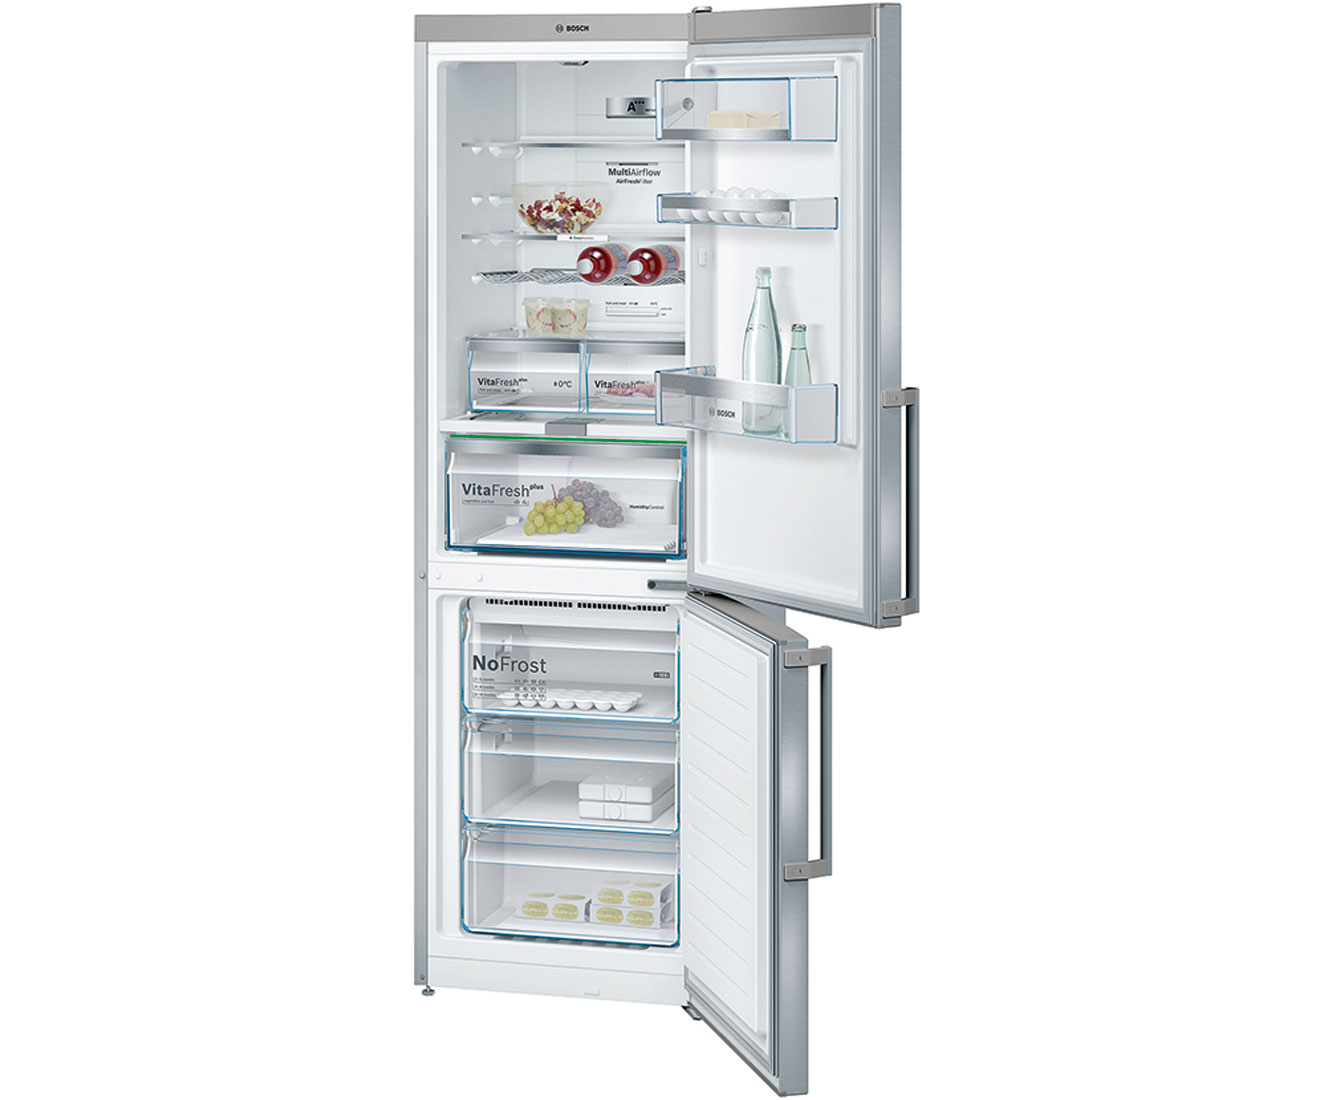 Siemens Kühlschrank Vitafresh Bedienungsanleitung : Bosch serie geschirrspüler bedienungsanleitung video